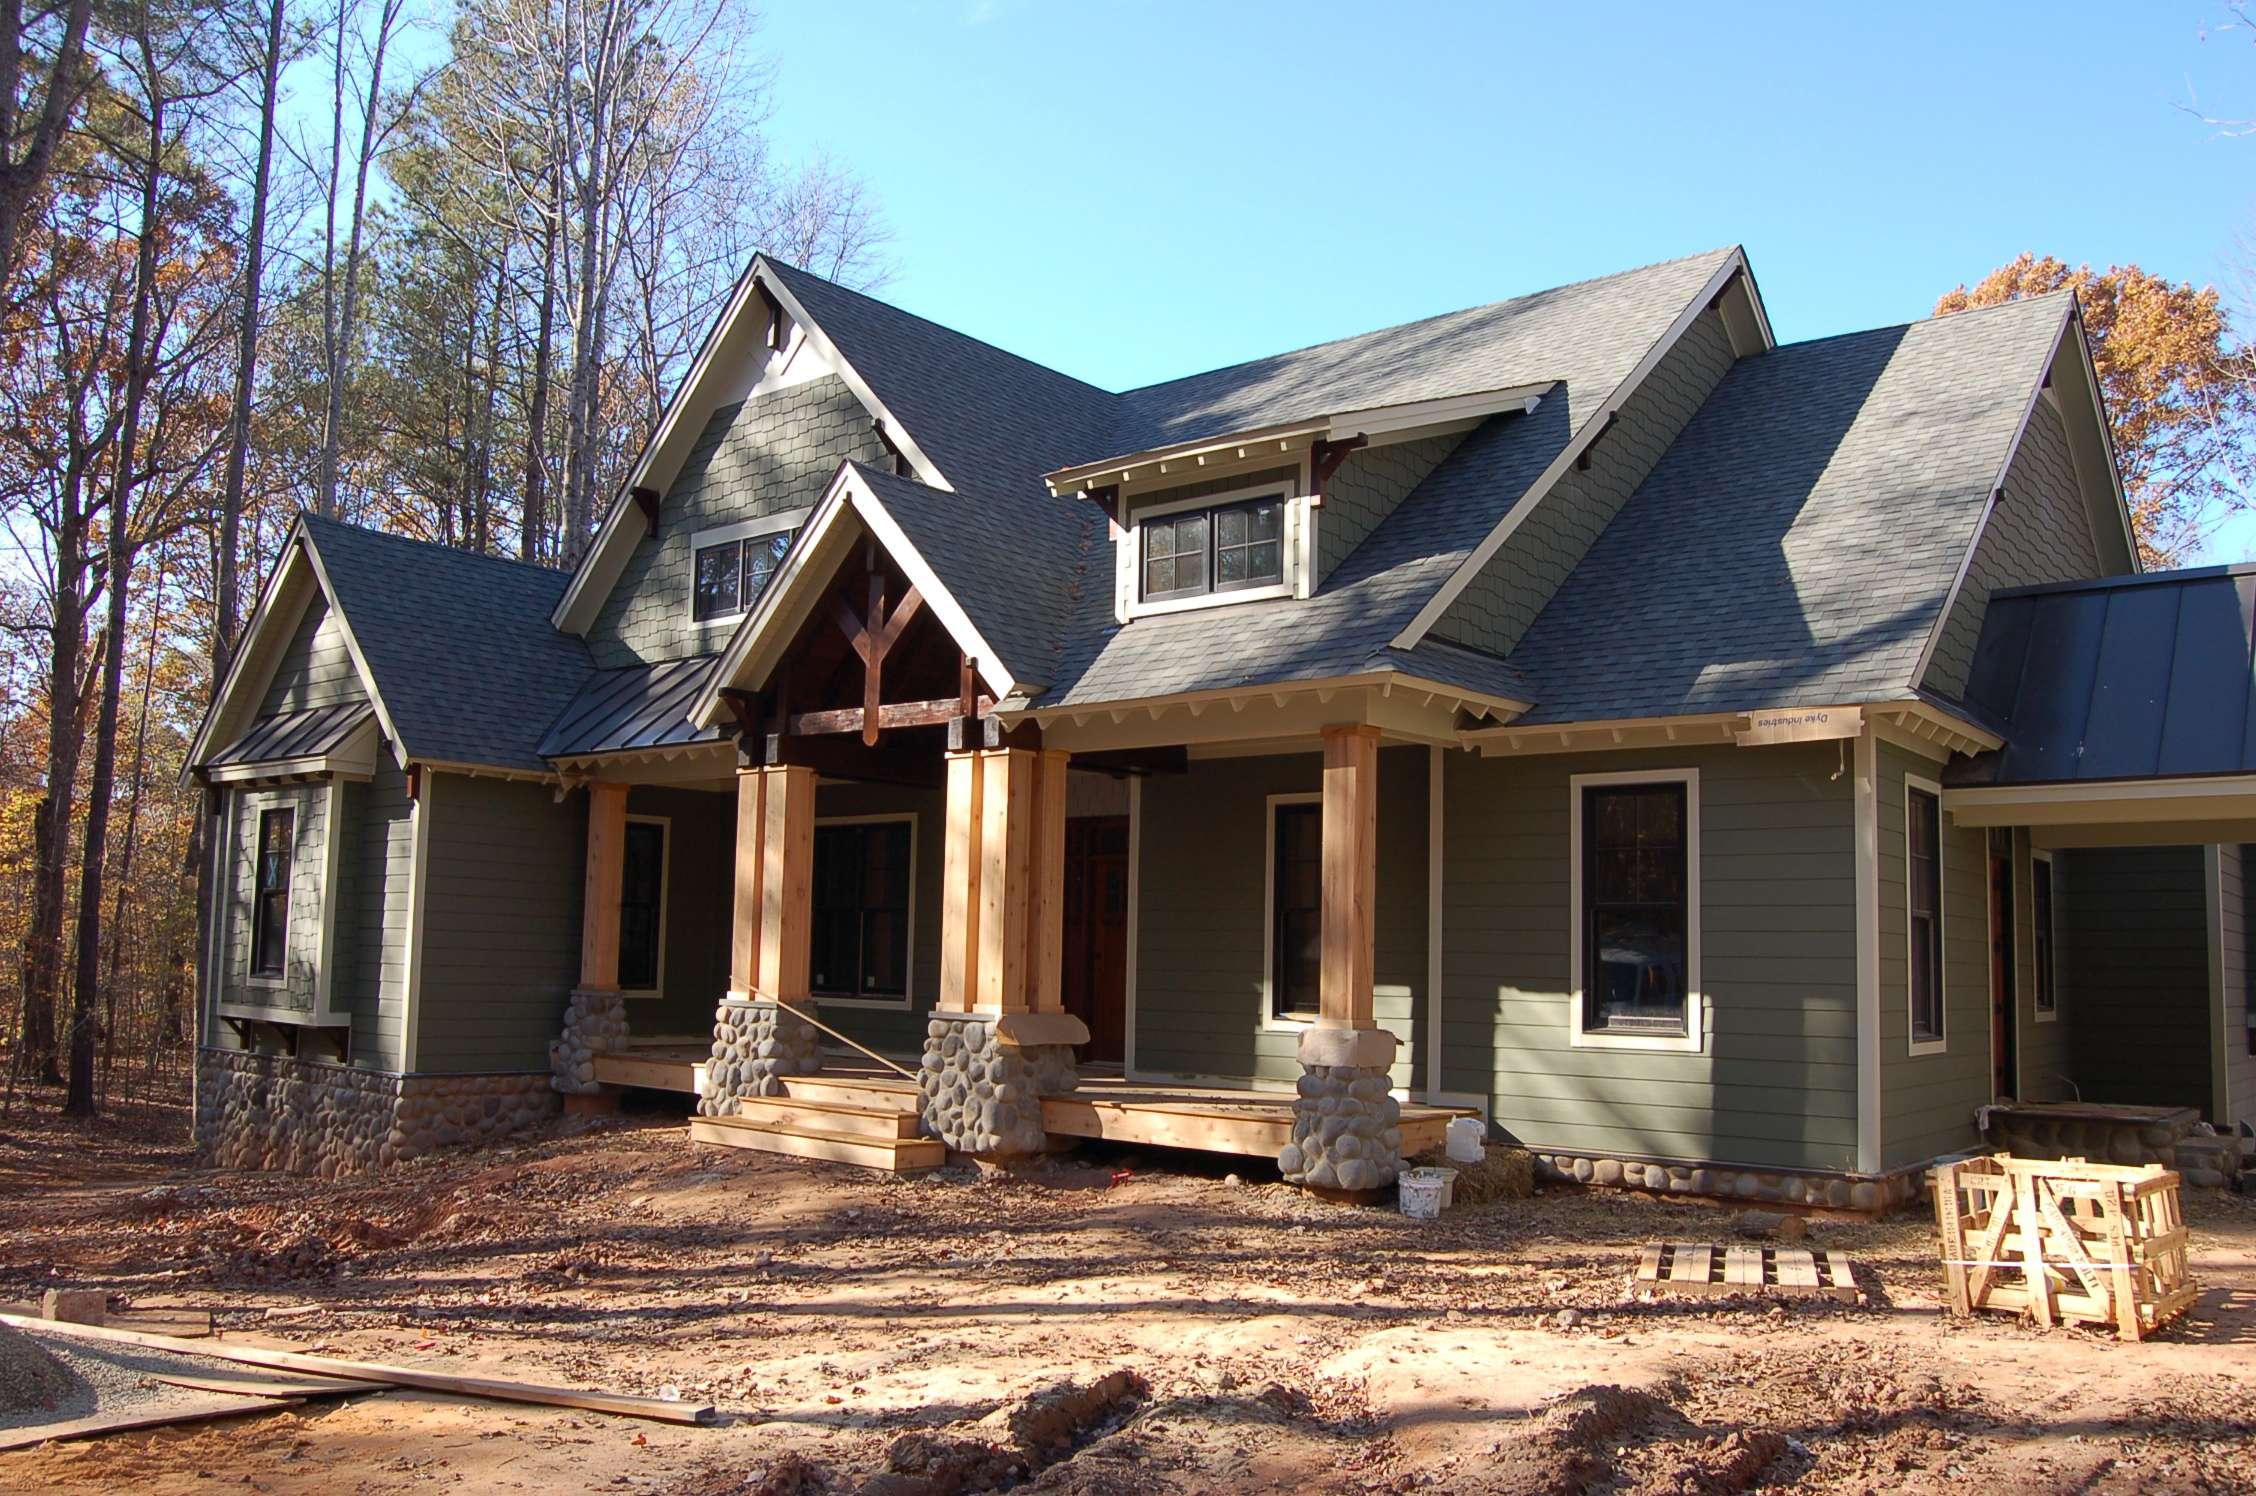 Favored Craftsman Style Homes Great Pair Pillars Verandas